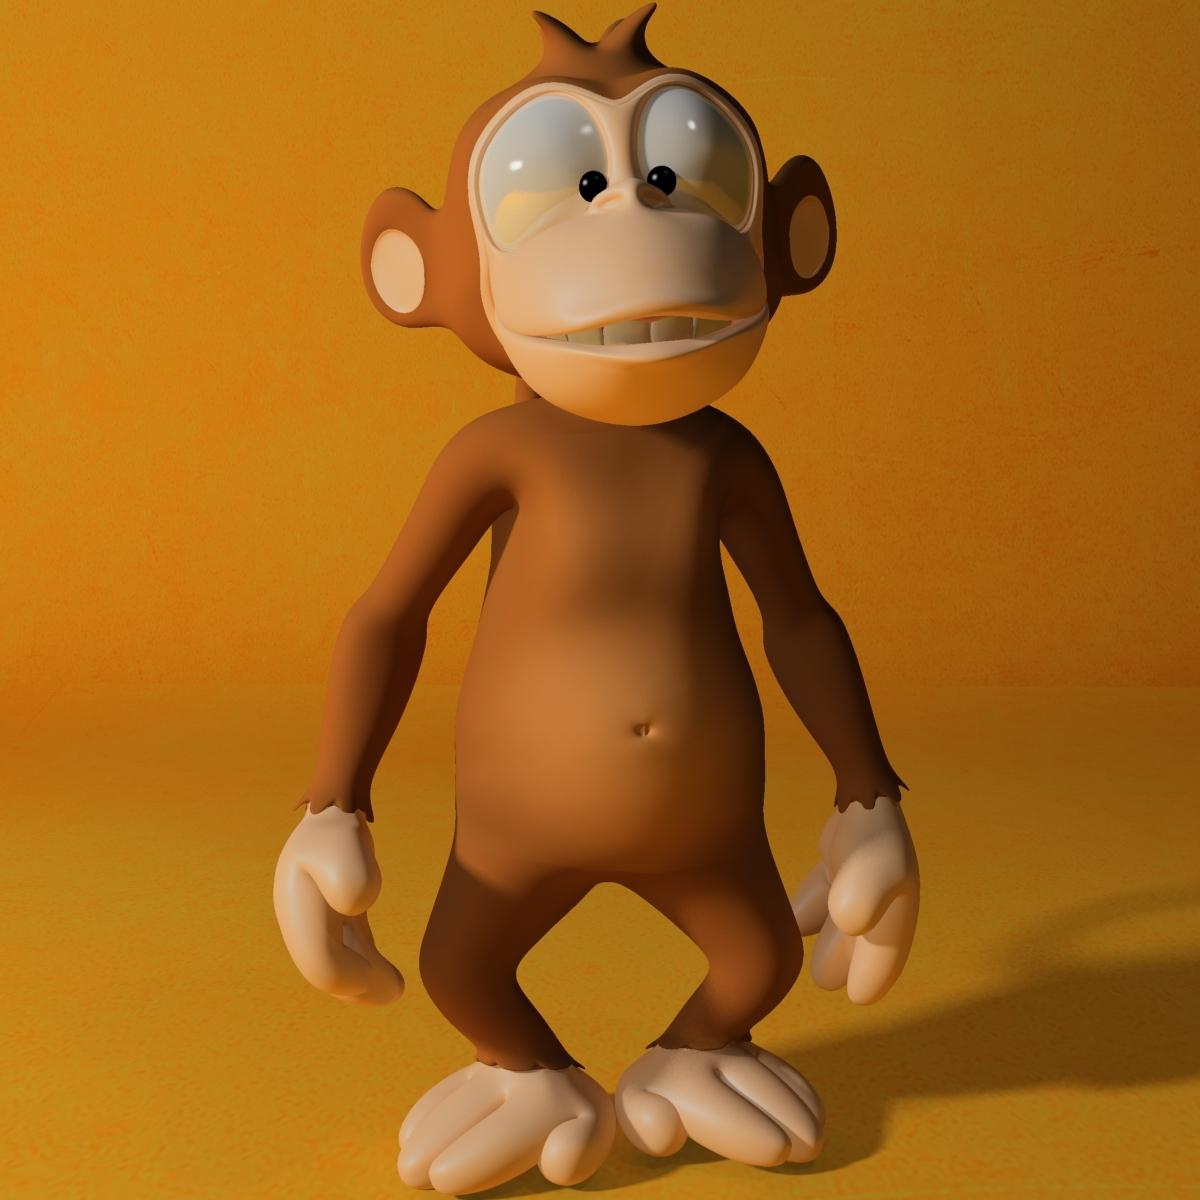 Cartoon monkey RIGGED 3D Model